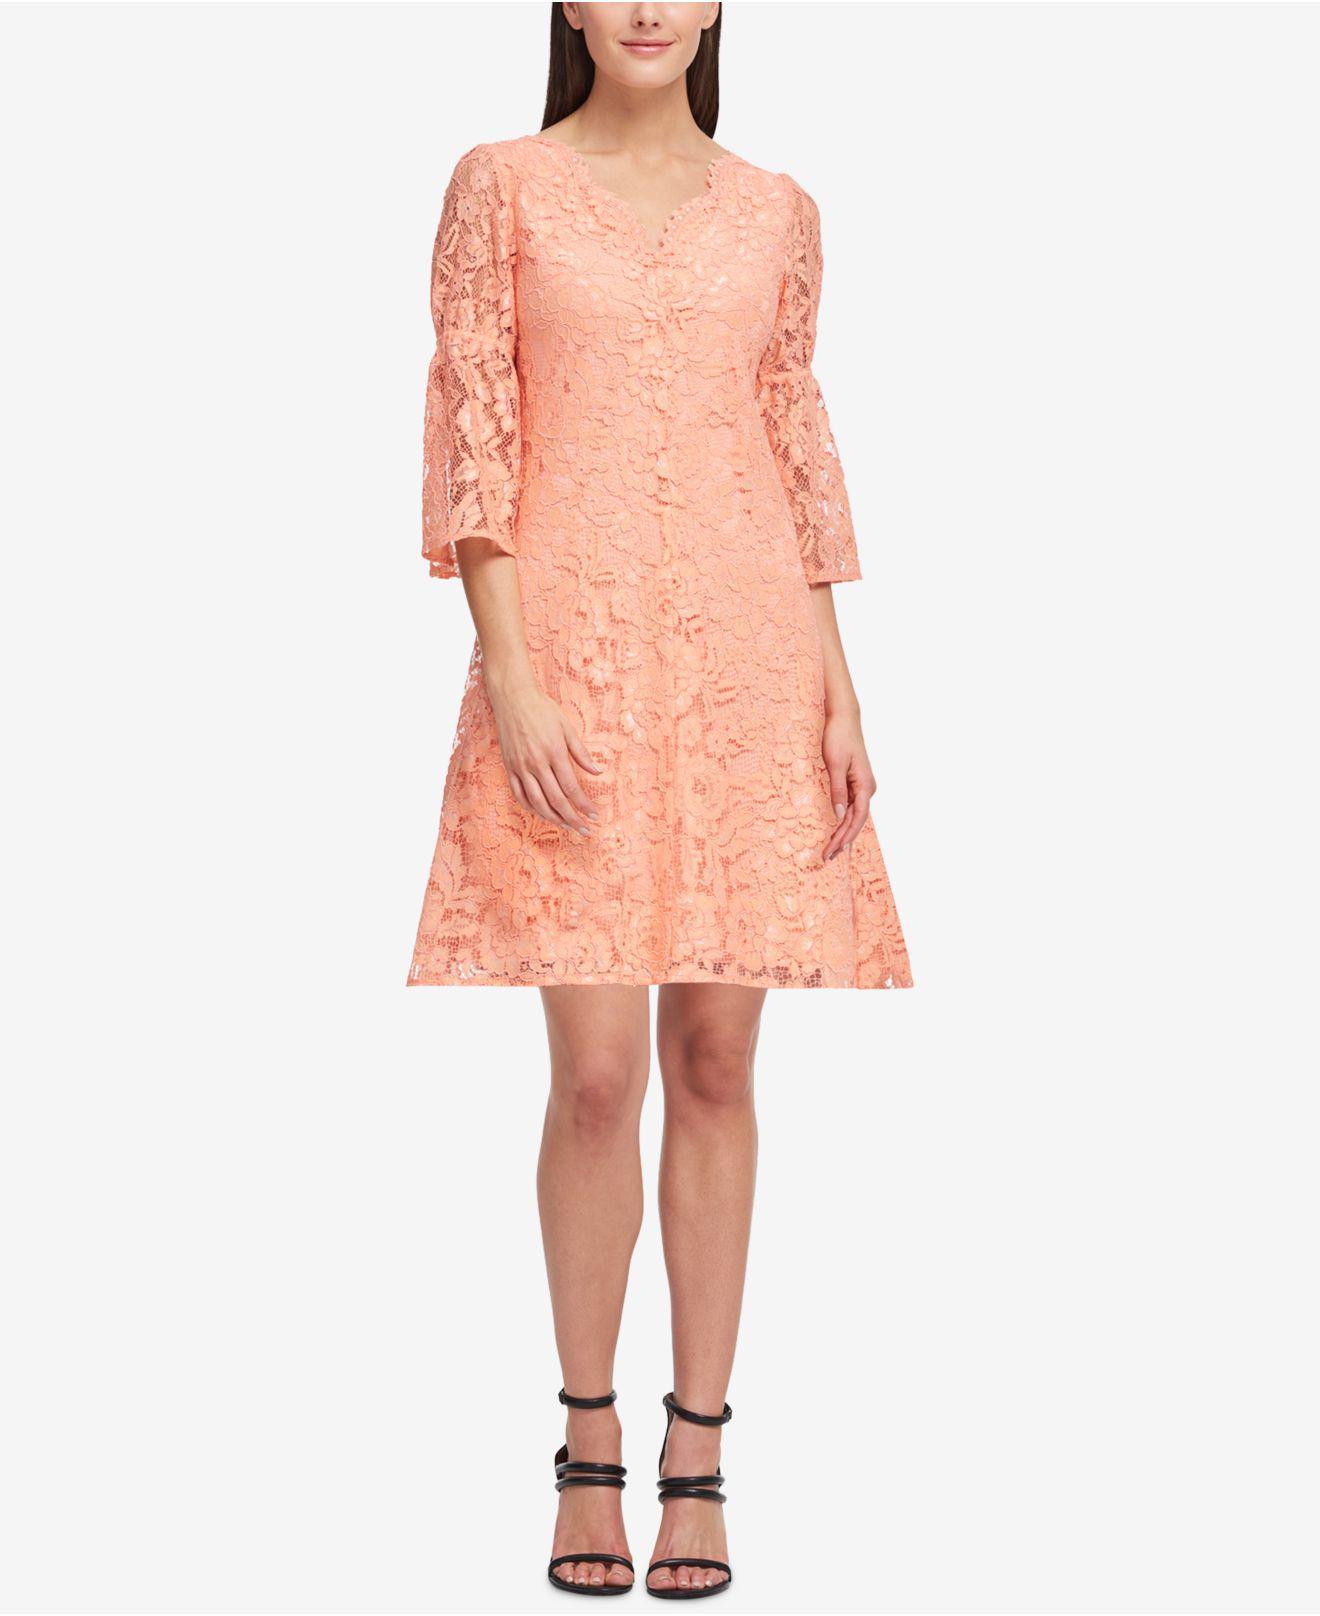 Dkny Pink Lace A Line Dress Created For Macys